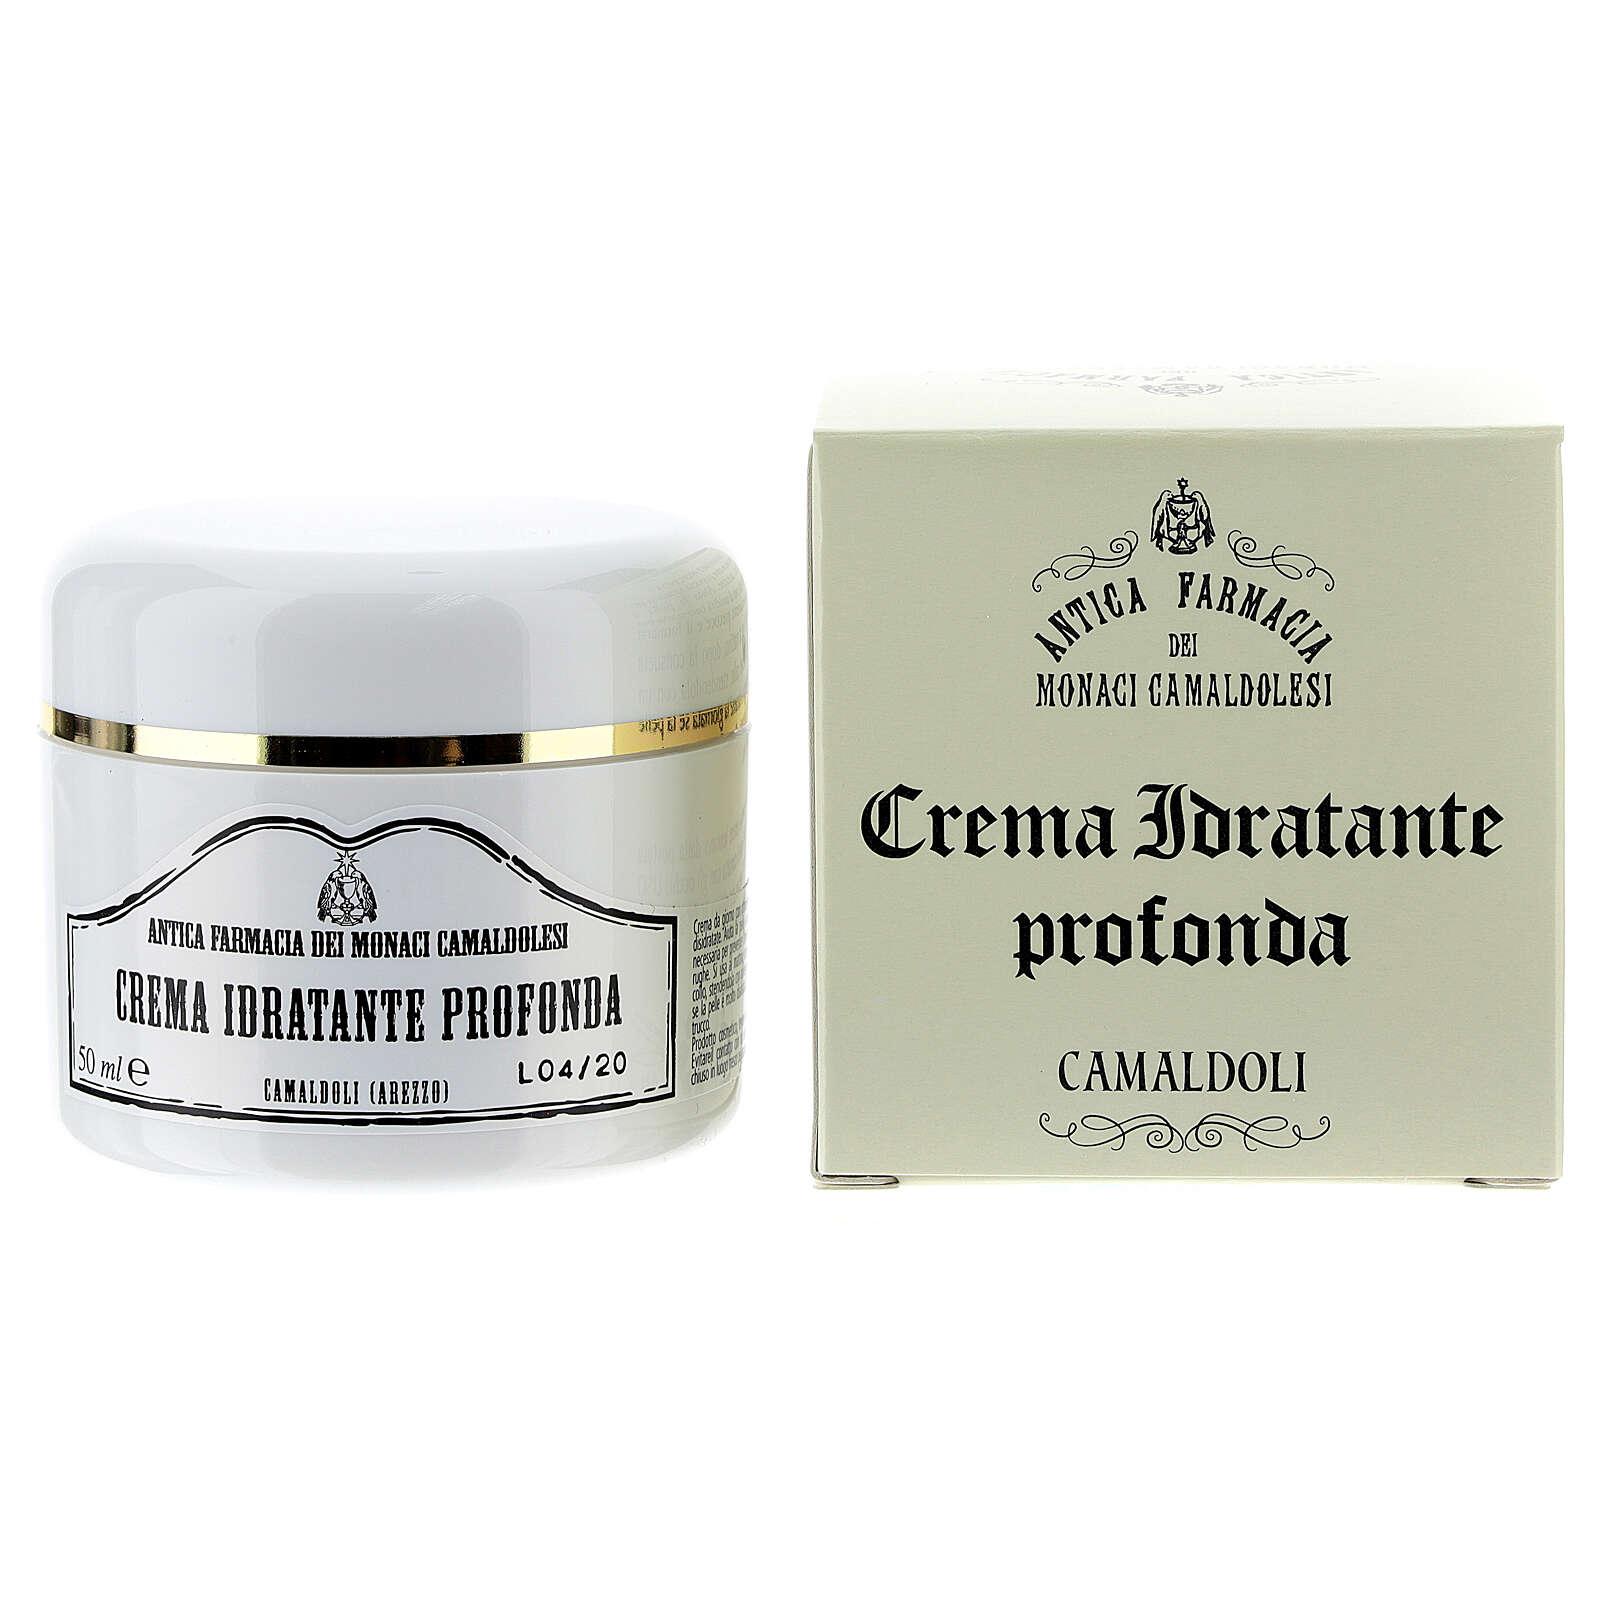 Crema Idratante Profonda  50 ml 4